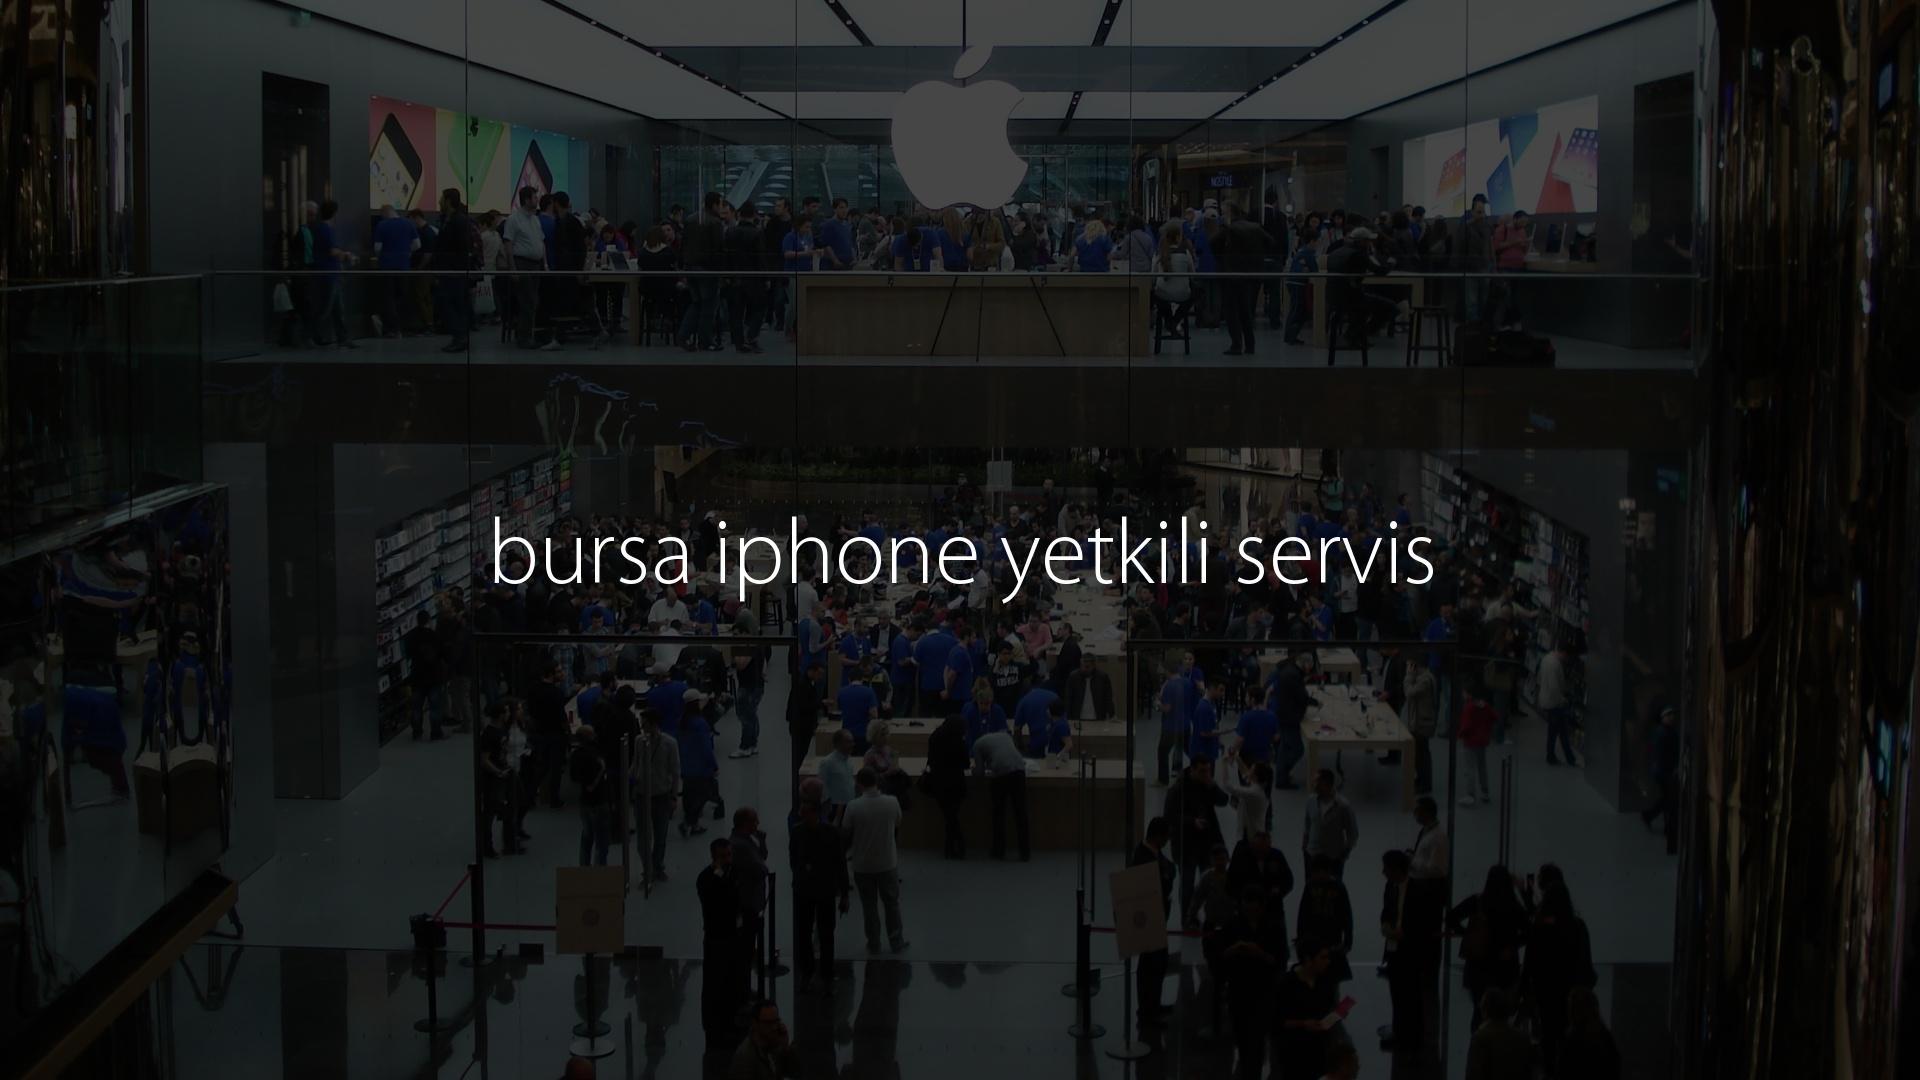 bursa iphone yetkili servis